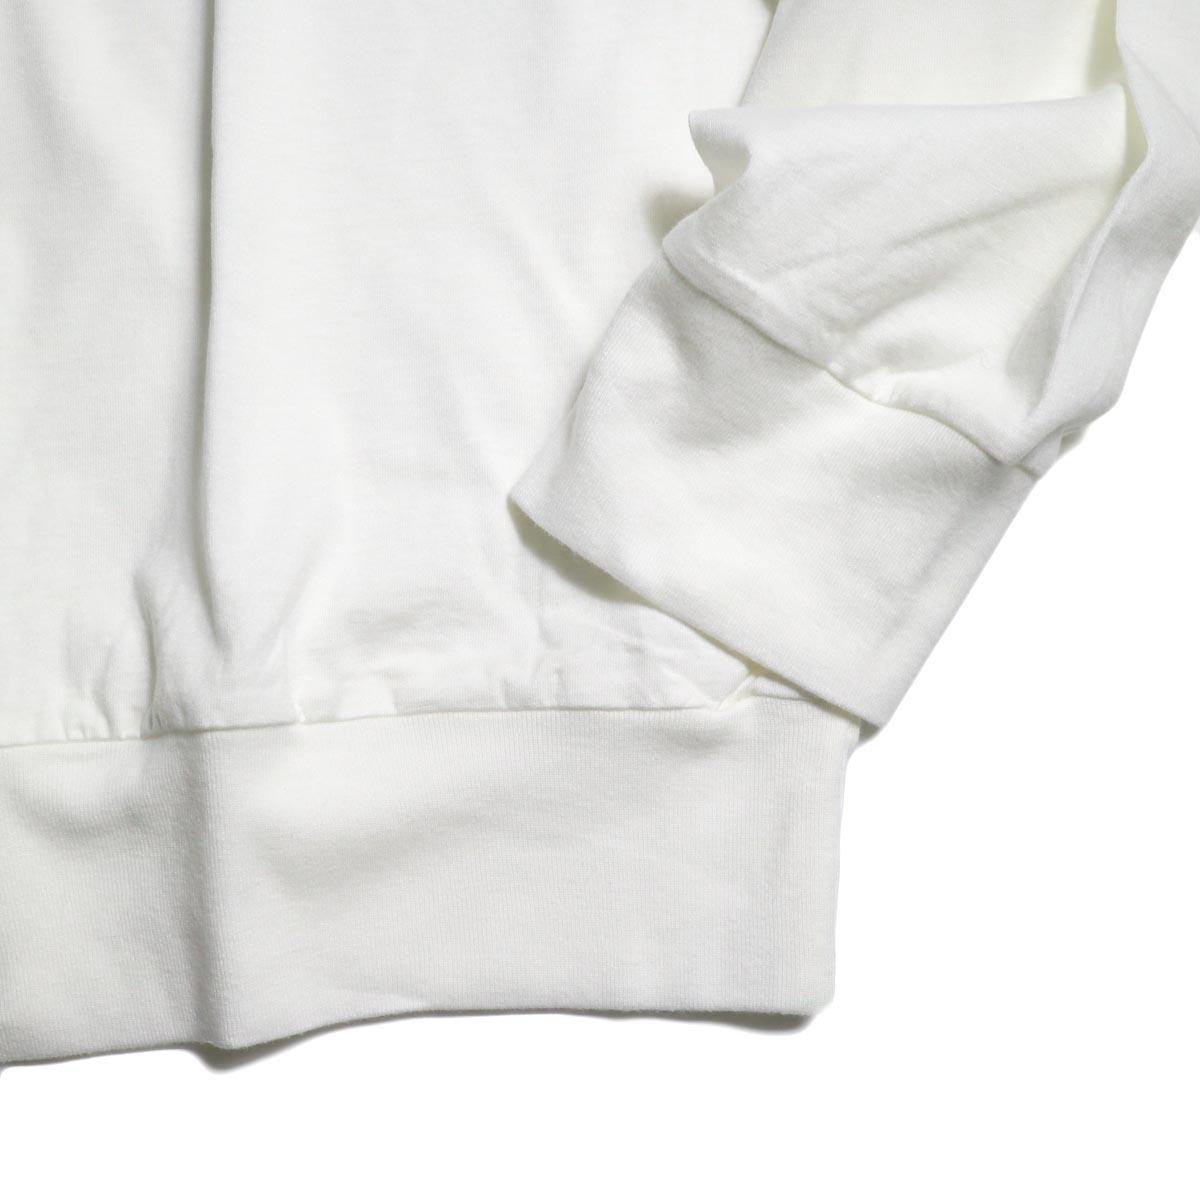 blurhms / Silk Cotton Jersey L/S P/O Loose Fit (White)袖、裾